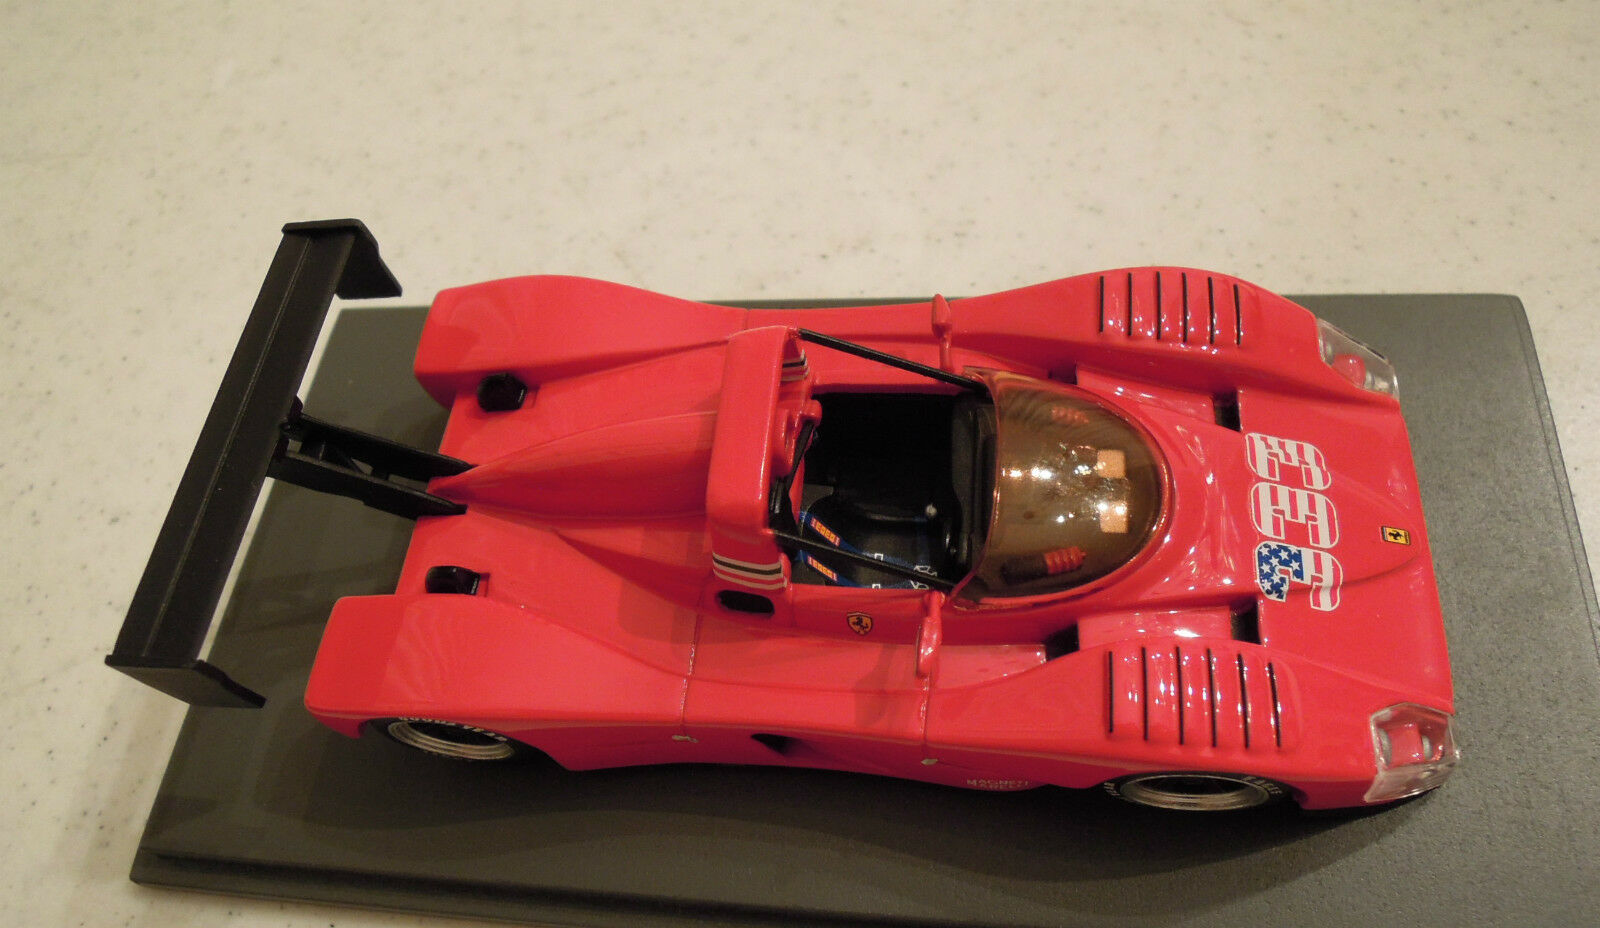 Ferrari 333 Presentation 1994 Spark Spark Spark Model 1 43, New in Box, Ships From USA de7e3b